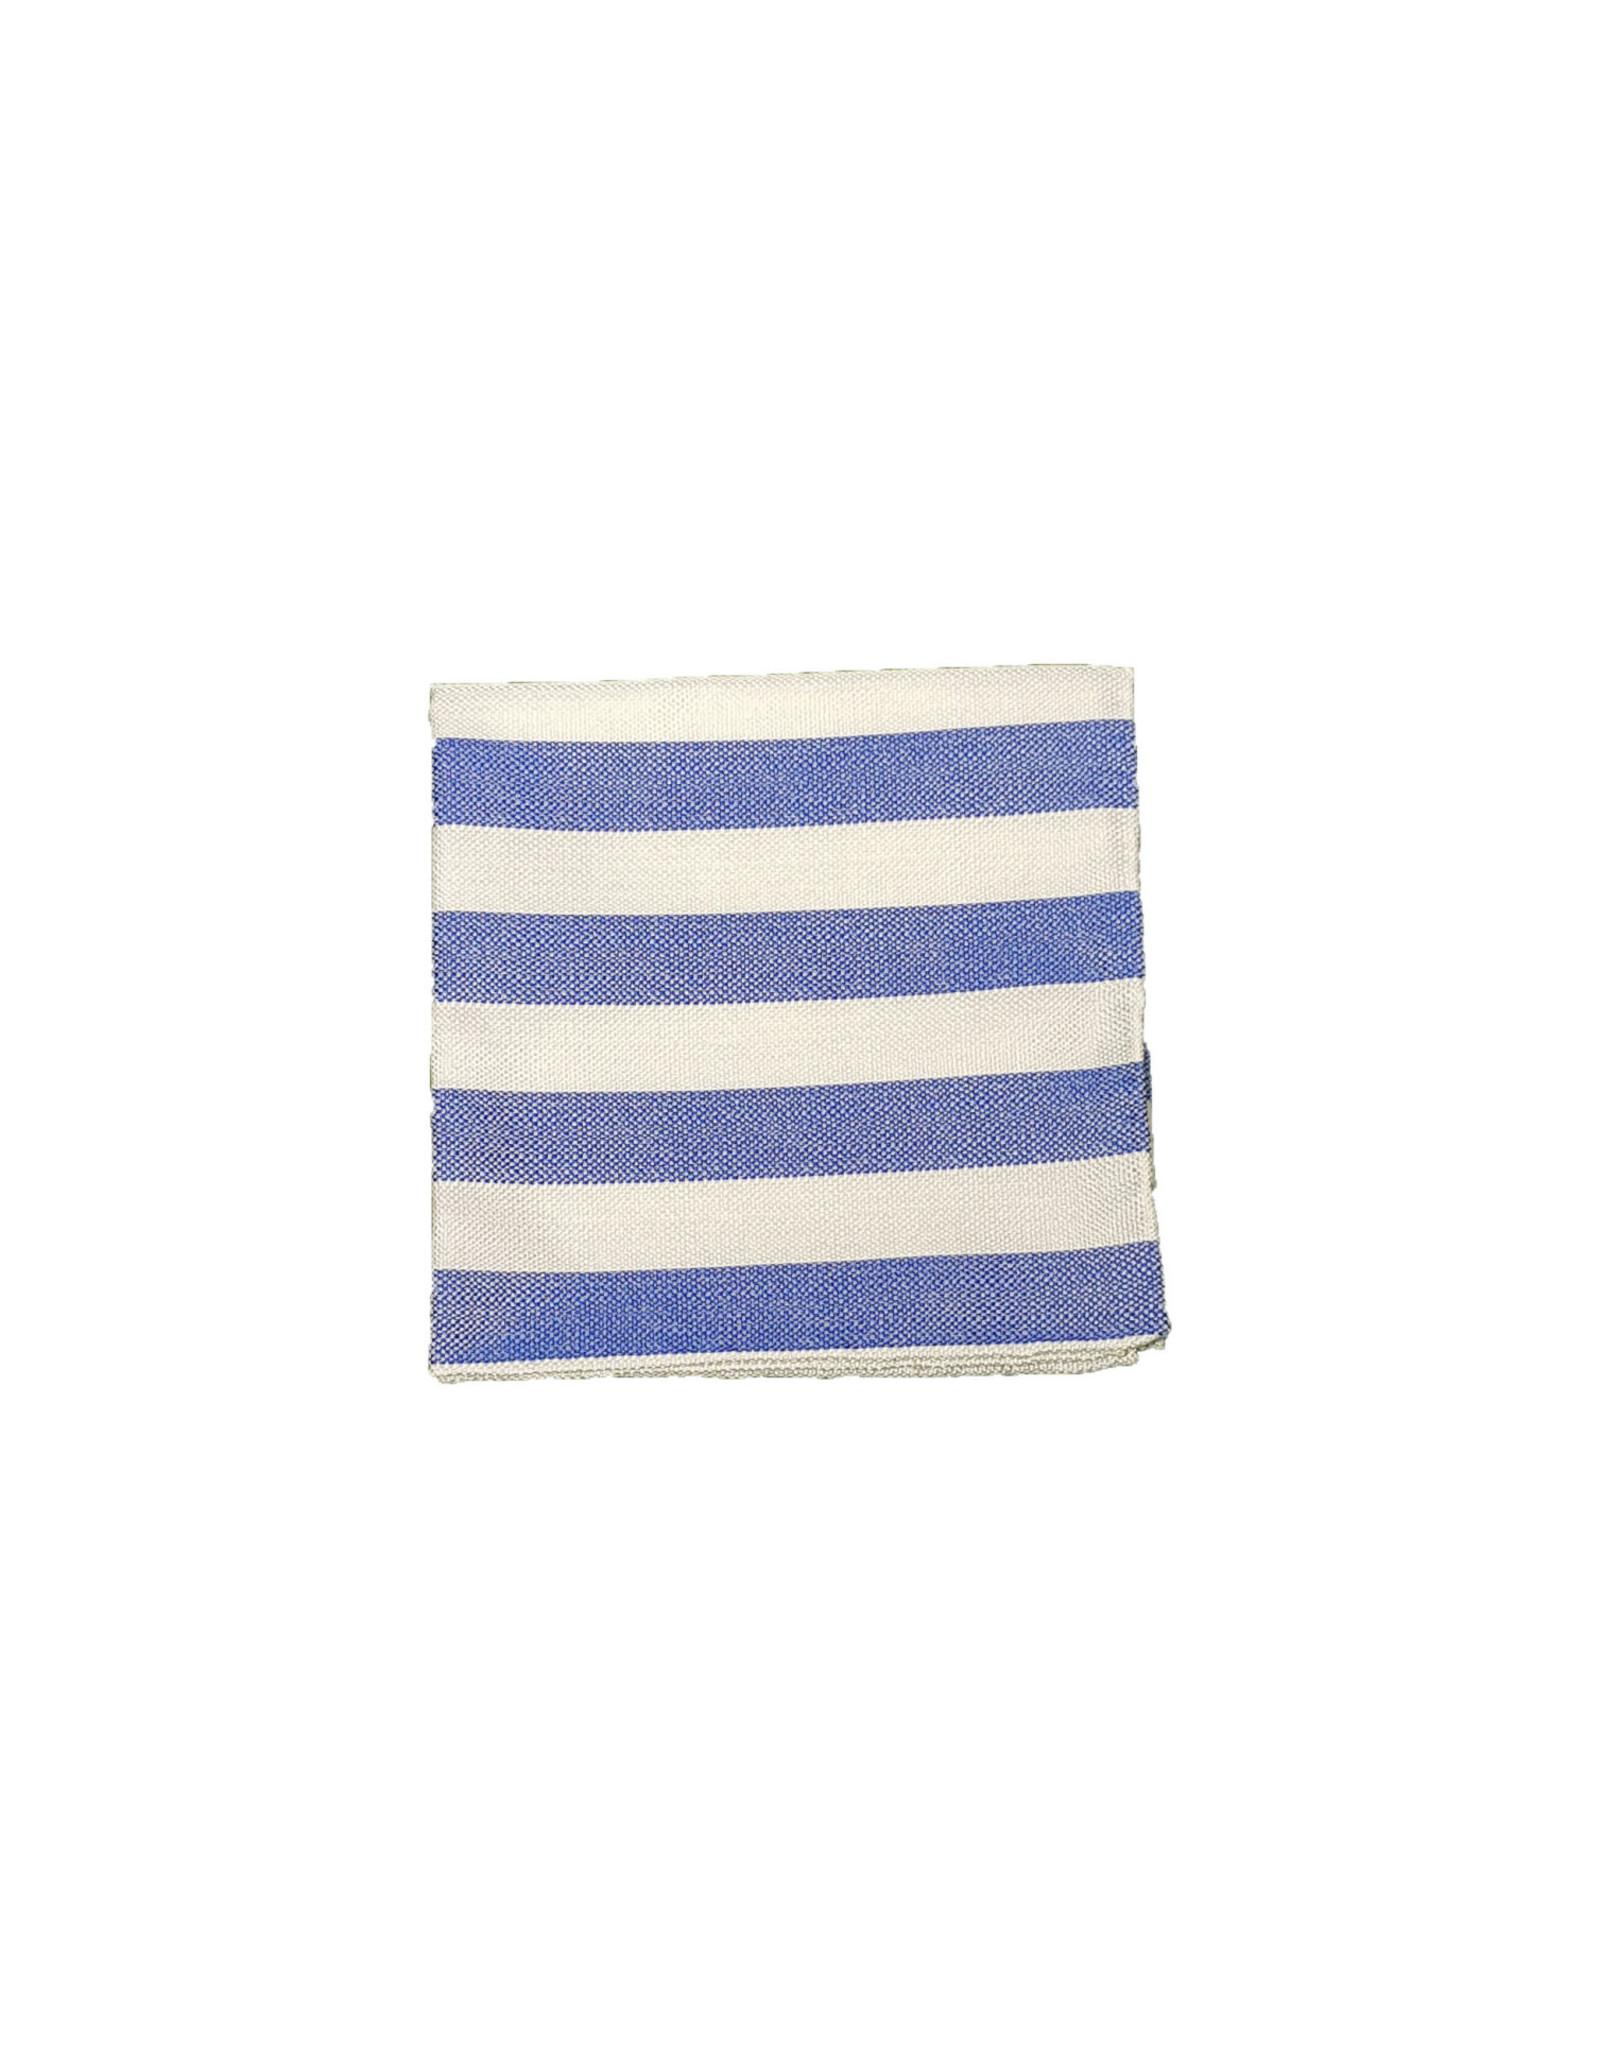 Ascot Sandmore's pochet blauw gestreept 375/2